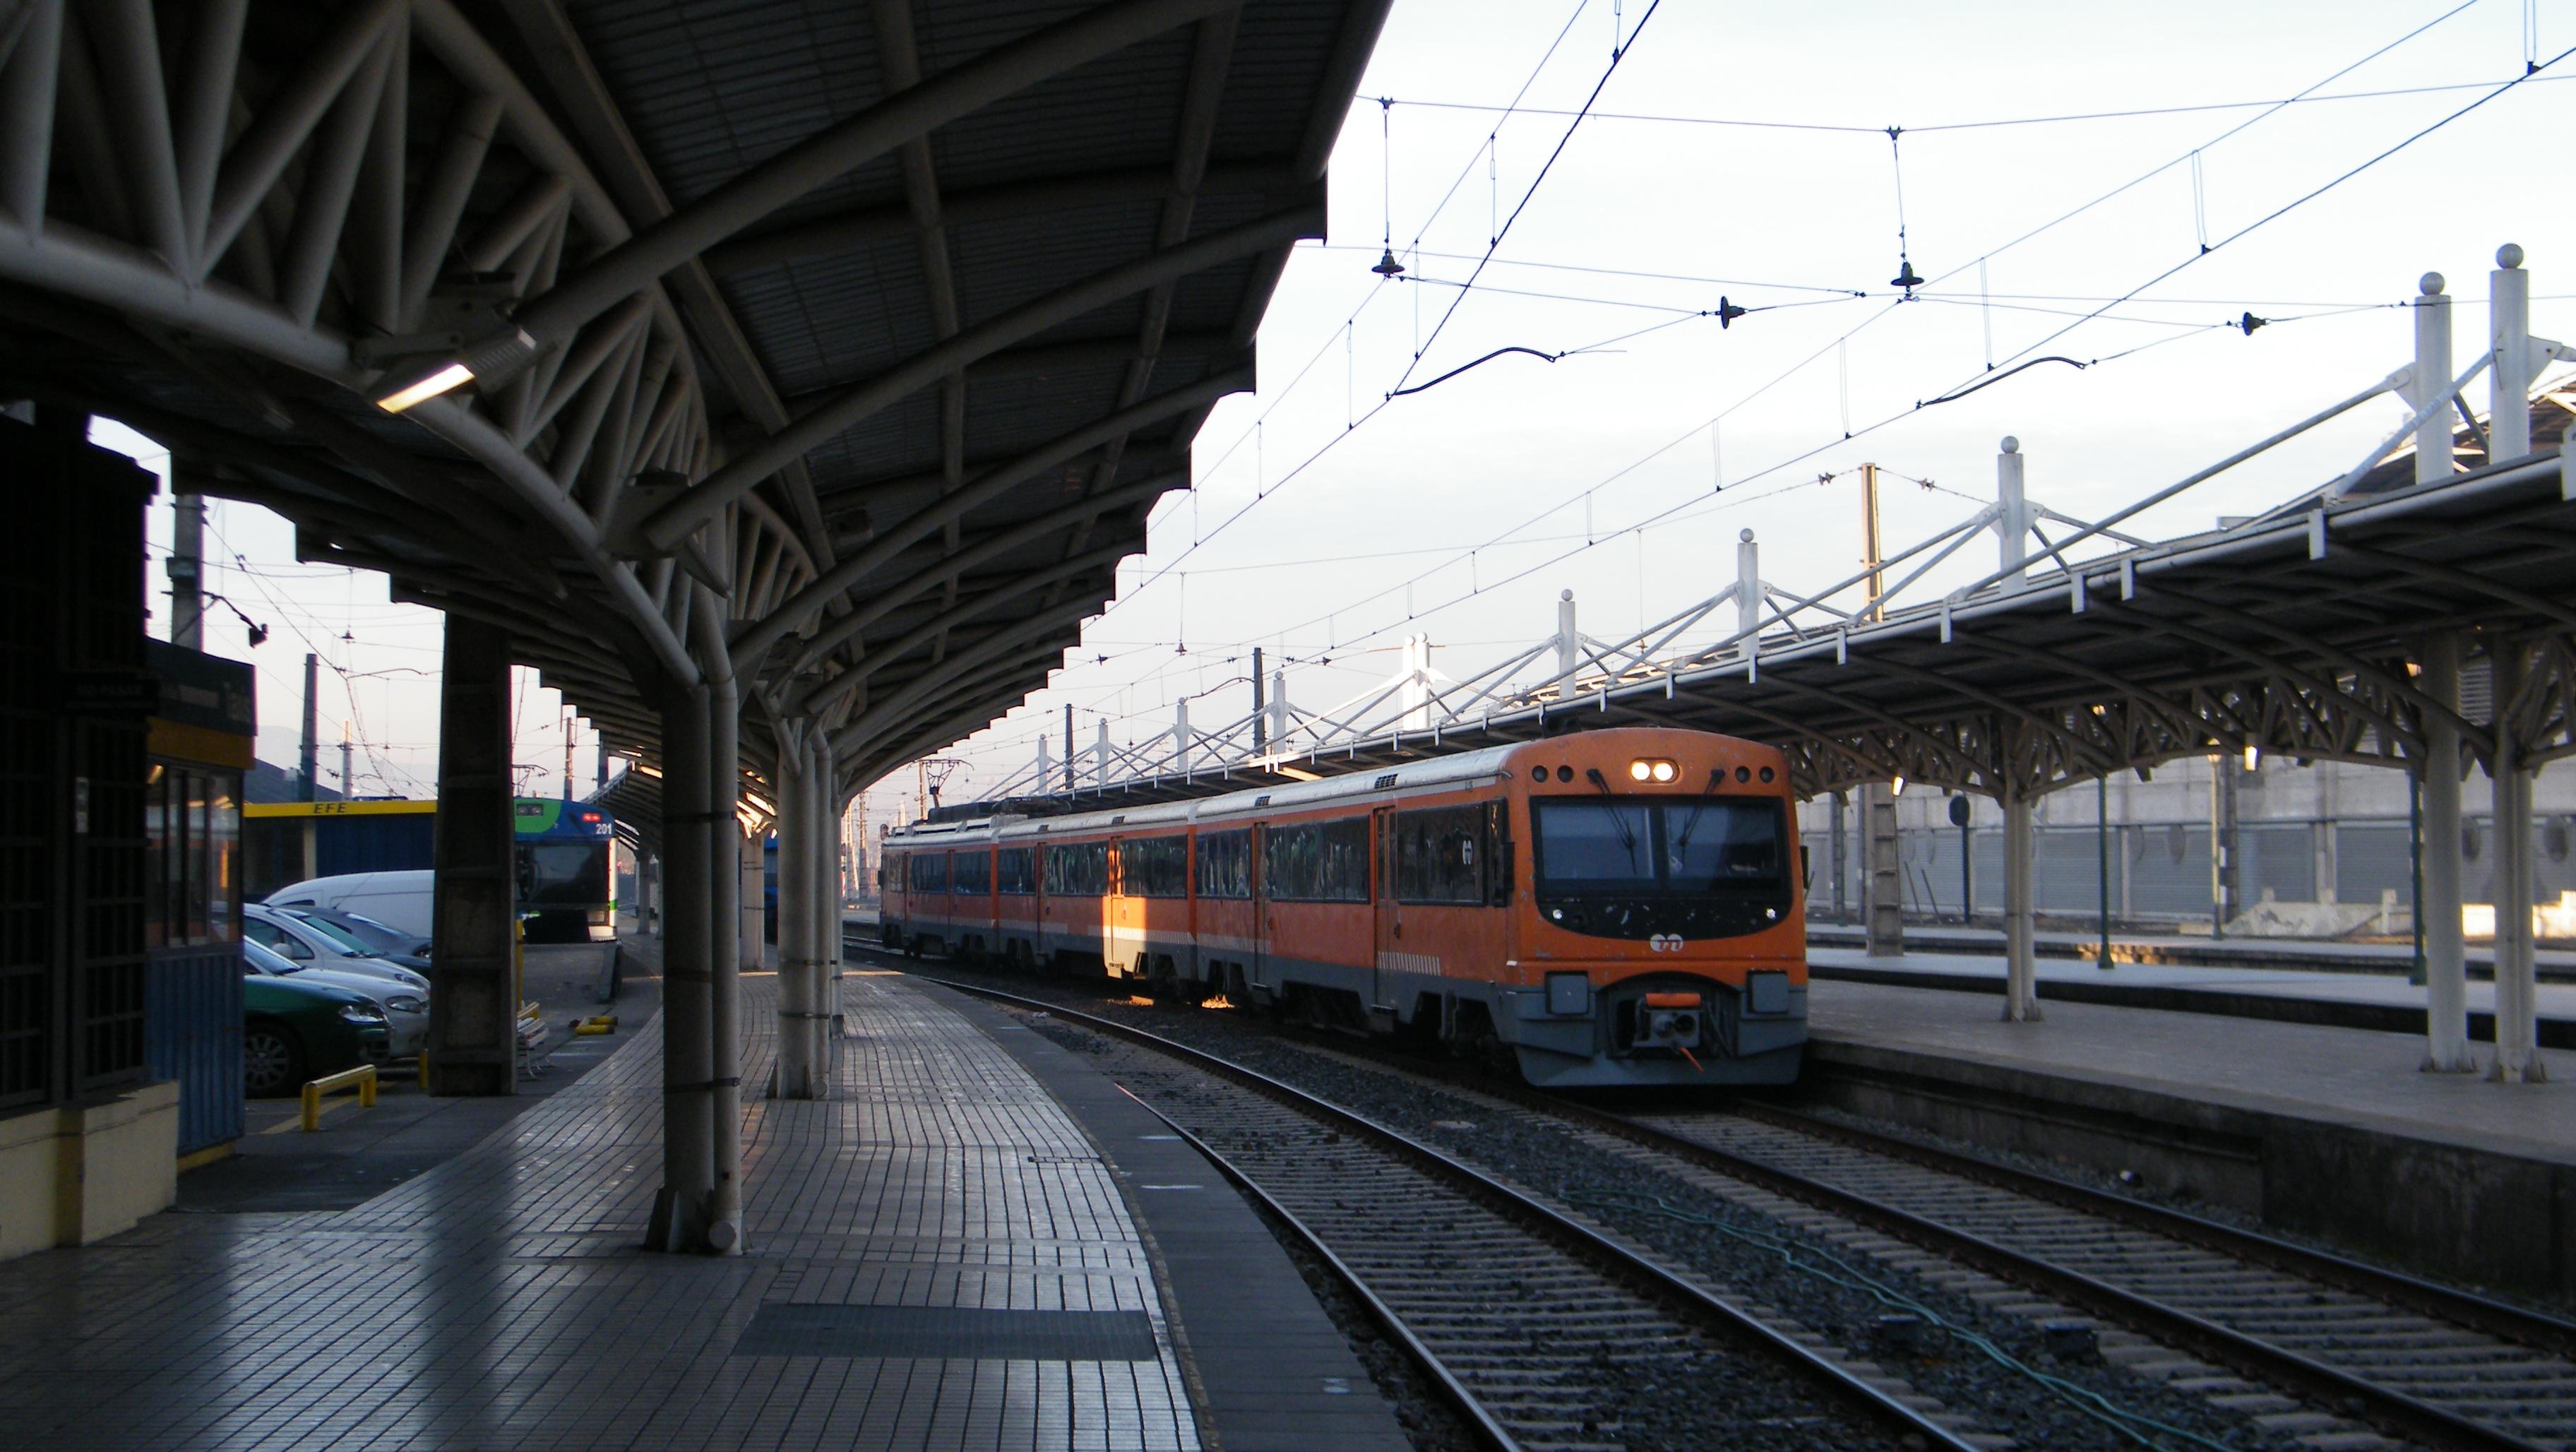 tren-a or trenbolone-acetate